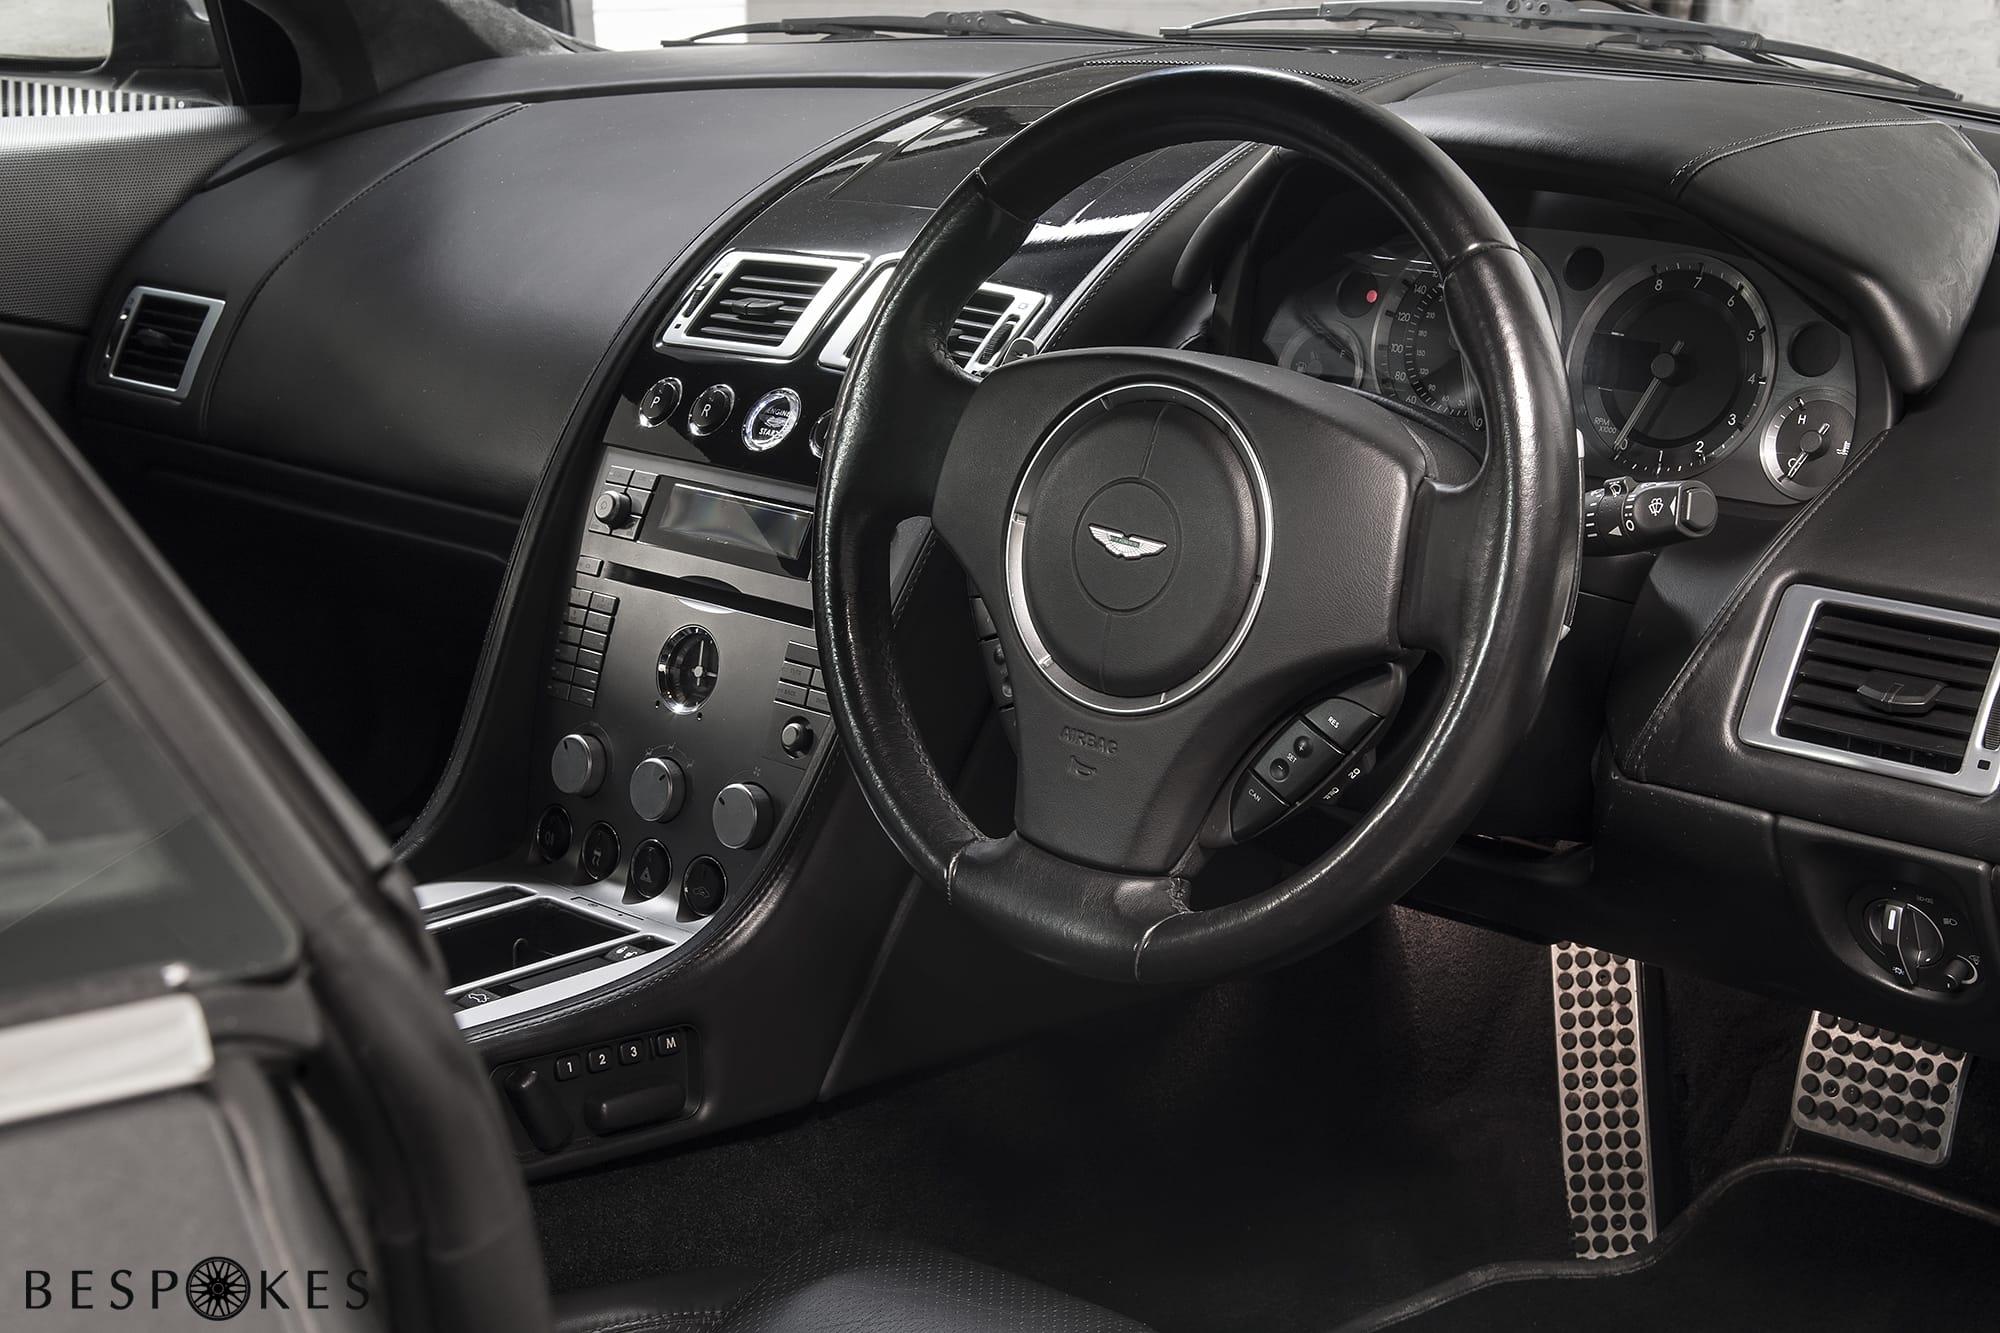 Aston Martin DB12 | Bespokes | aston martin db9 interior